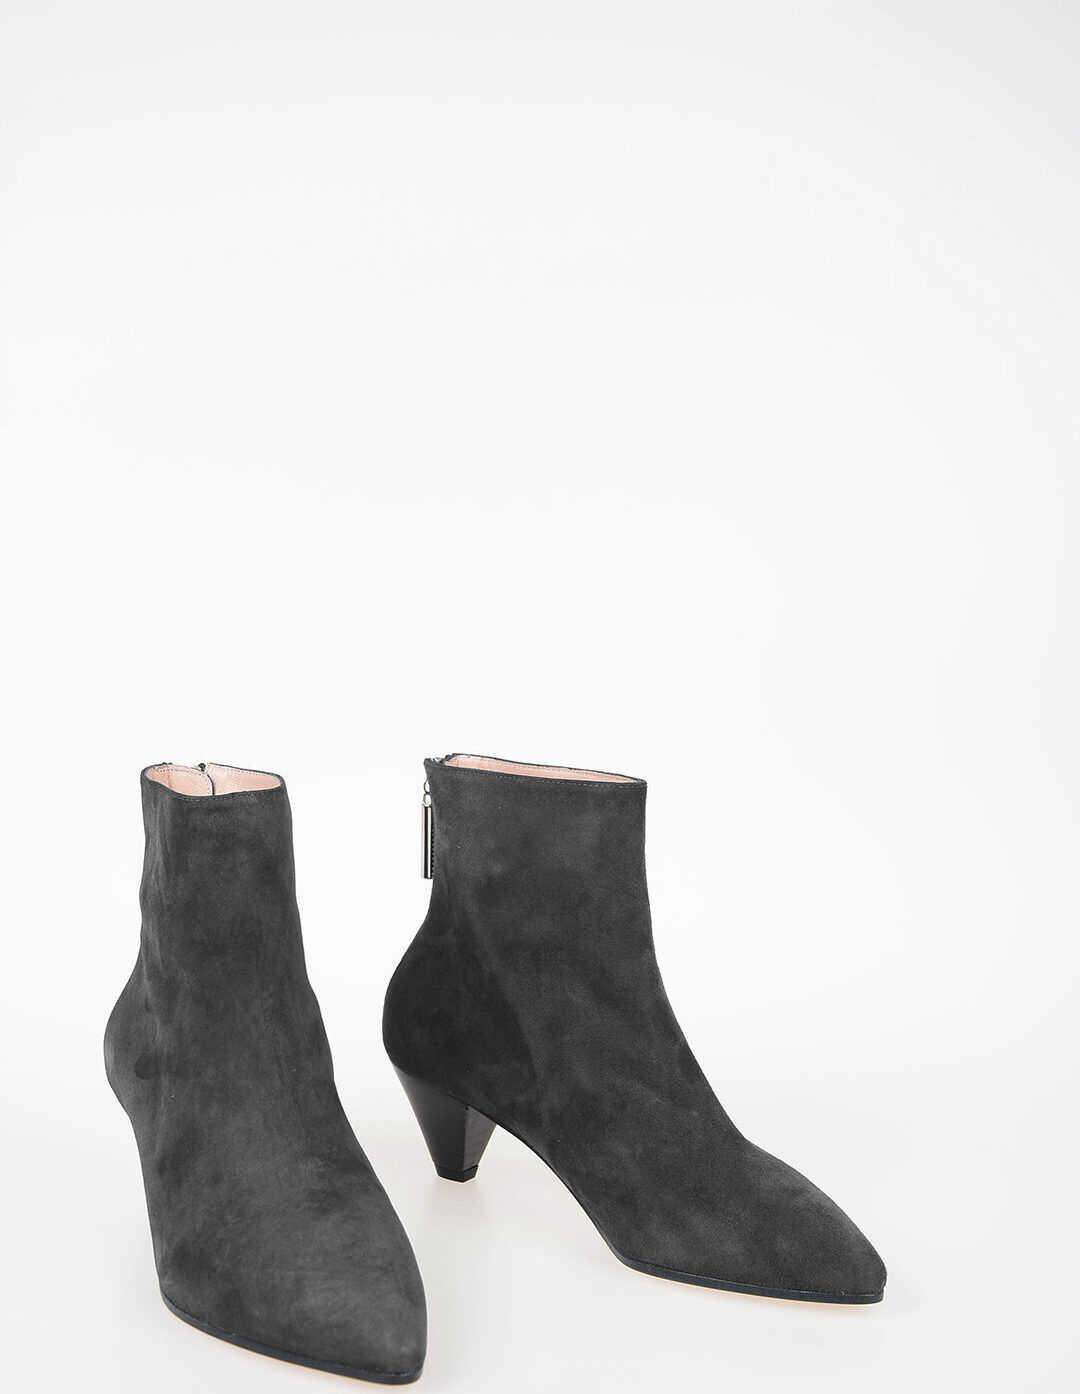 5cm PYRAMID Boots thumbnail